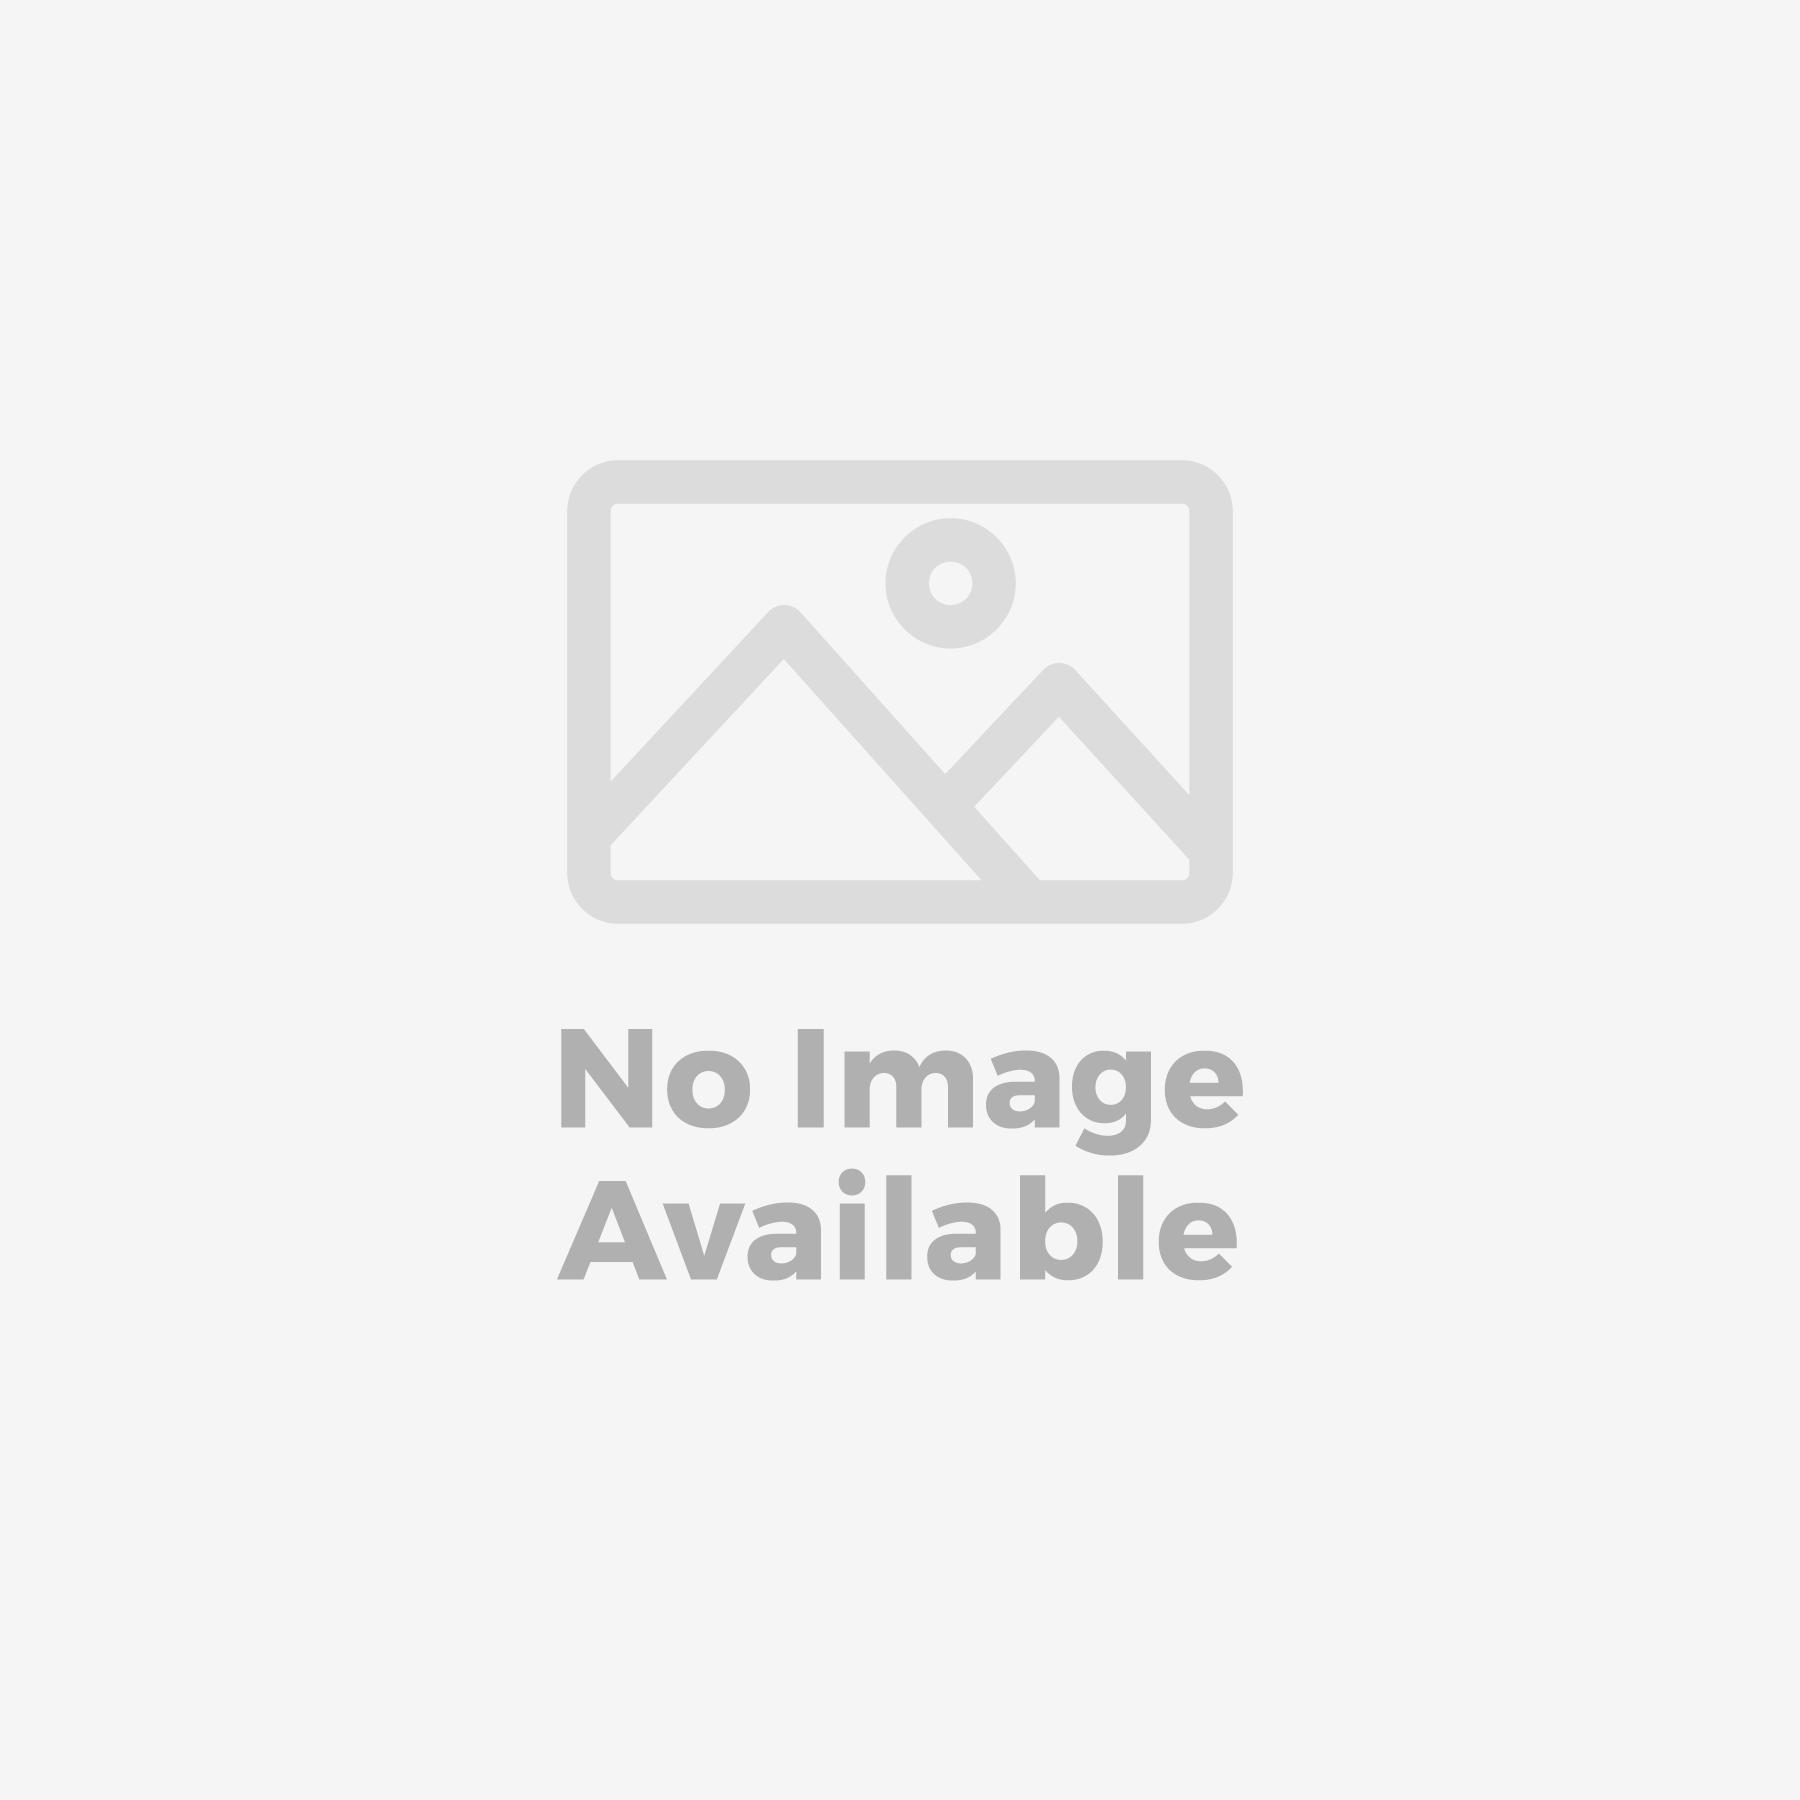 SOIE - Square End Table